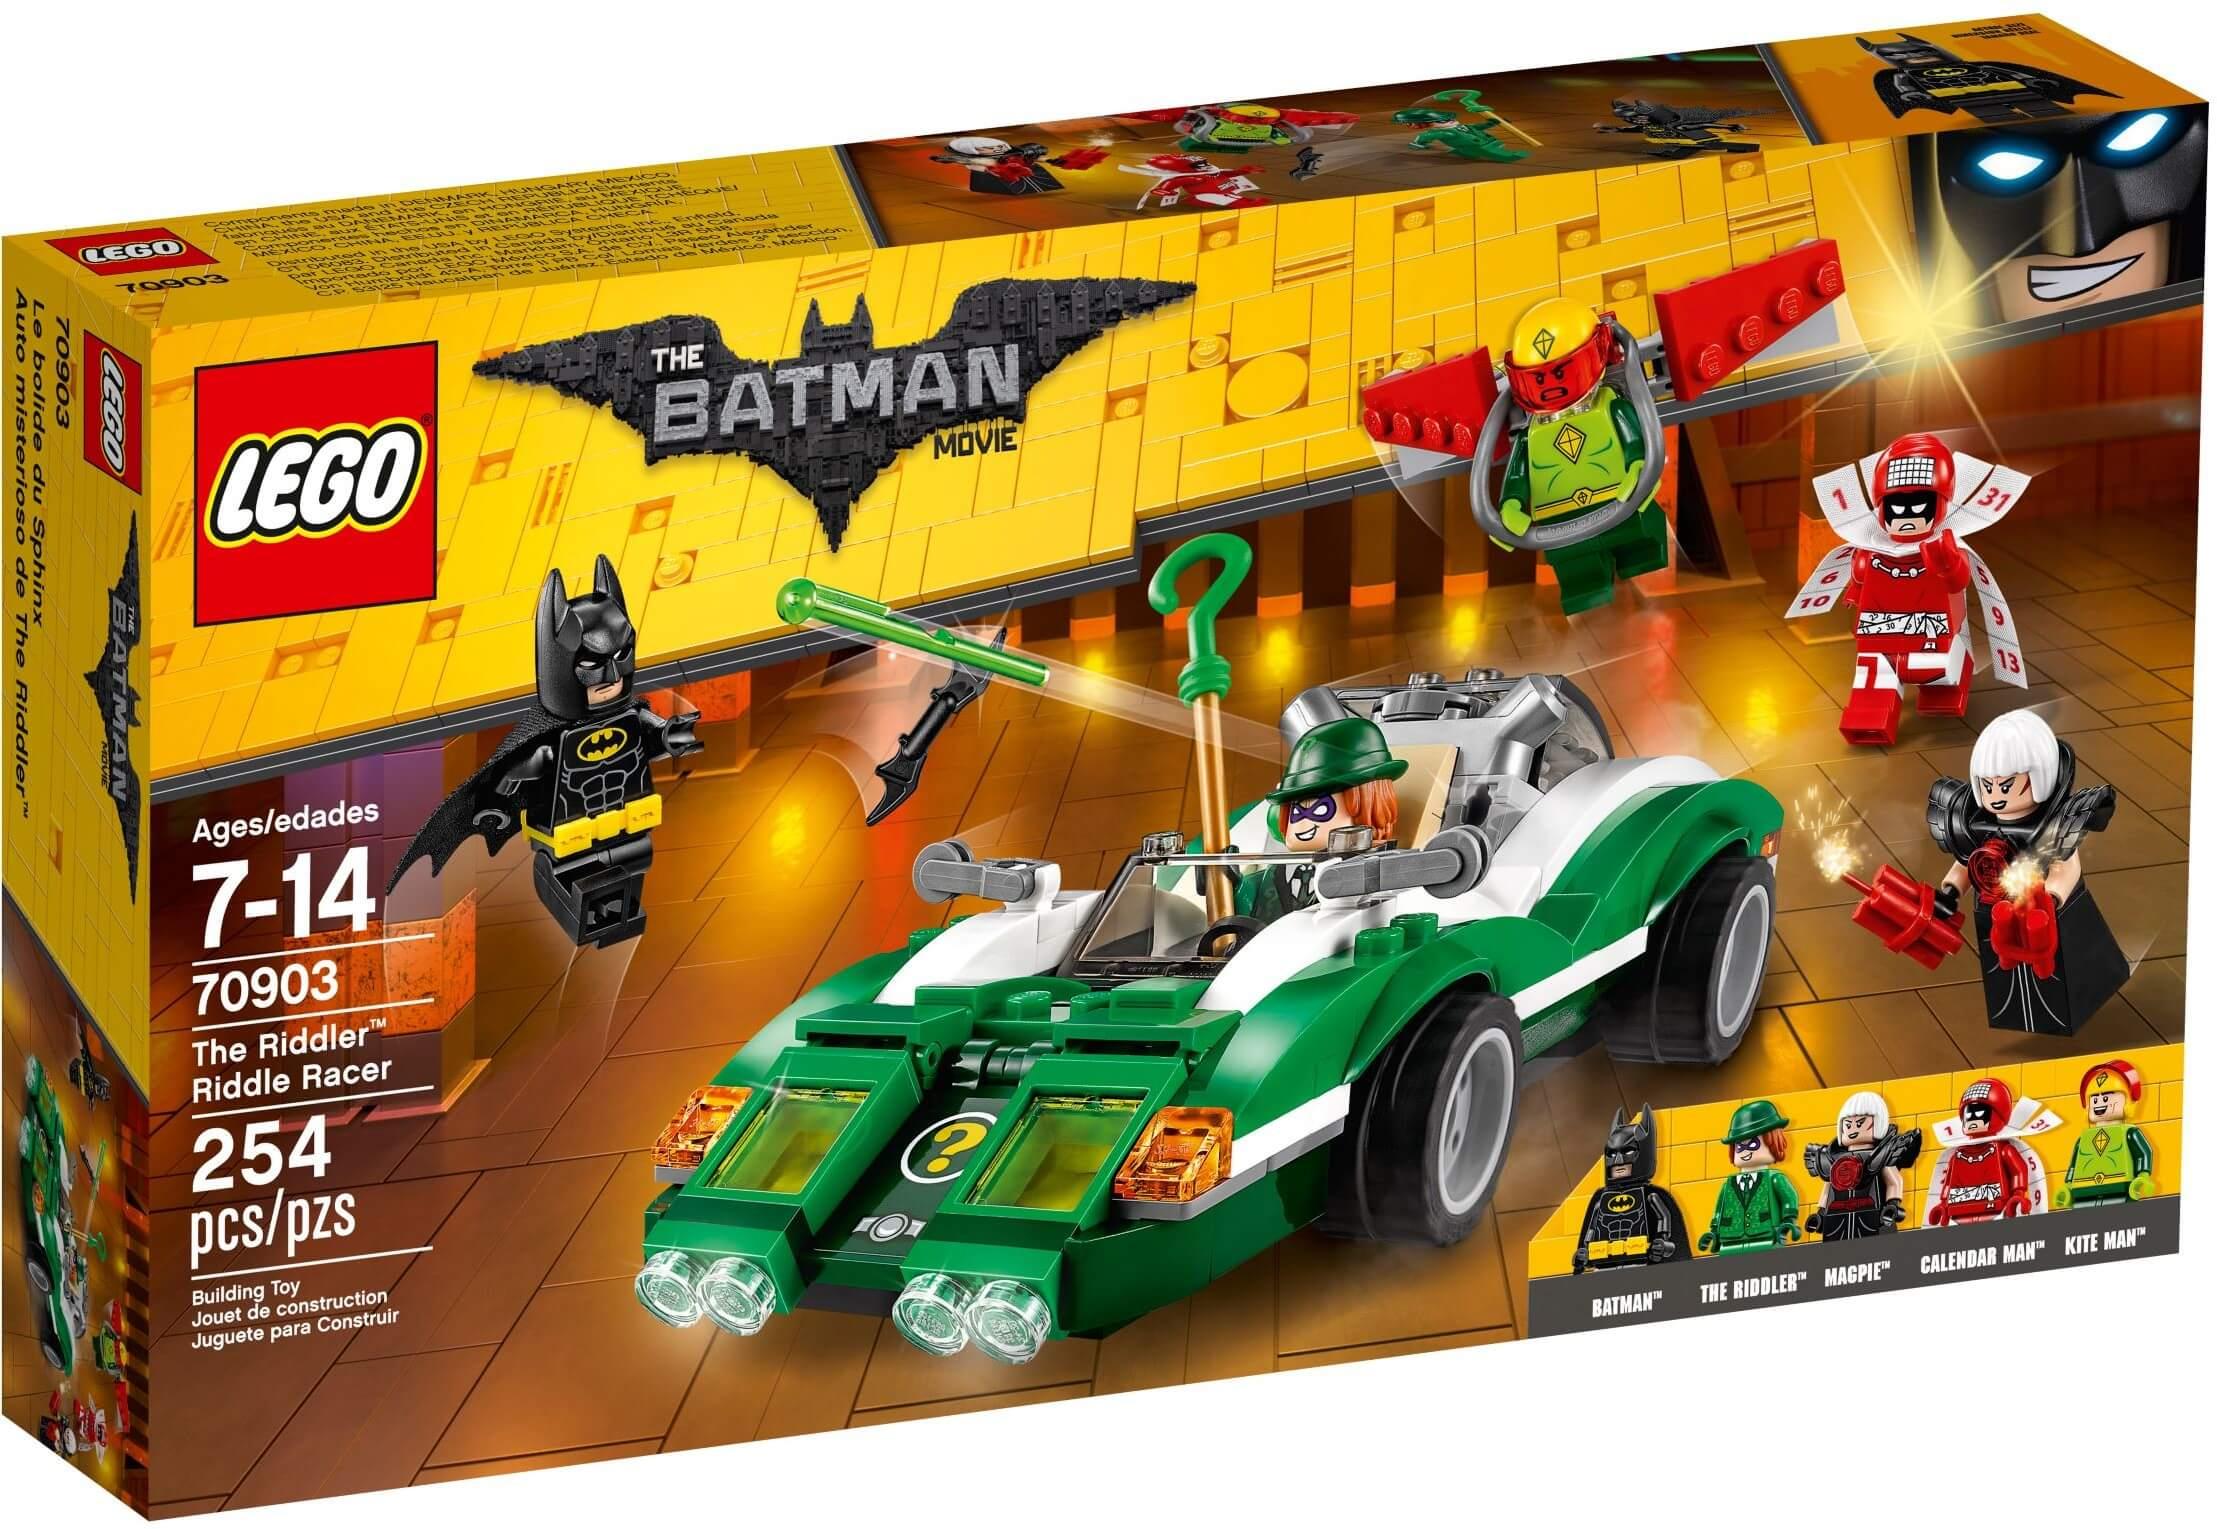 Mua đồ chơi LEGO 70903 - LEGO Batman Movie 70903 - Siêu Xe của Riddler (LEGO 70903 The Riddler Riddle Racer)